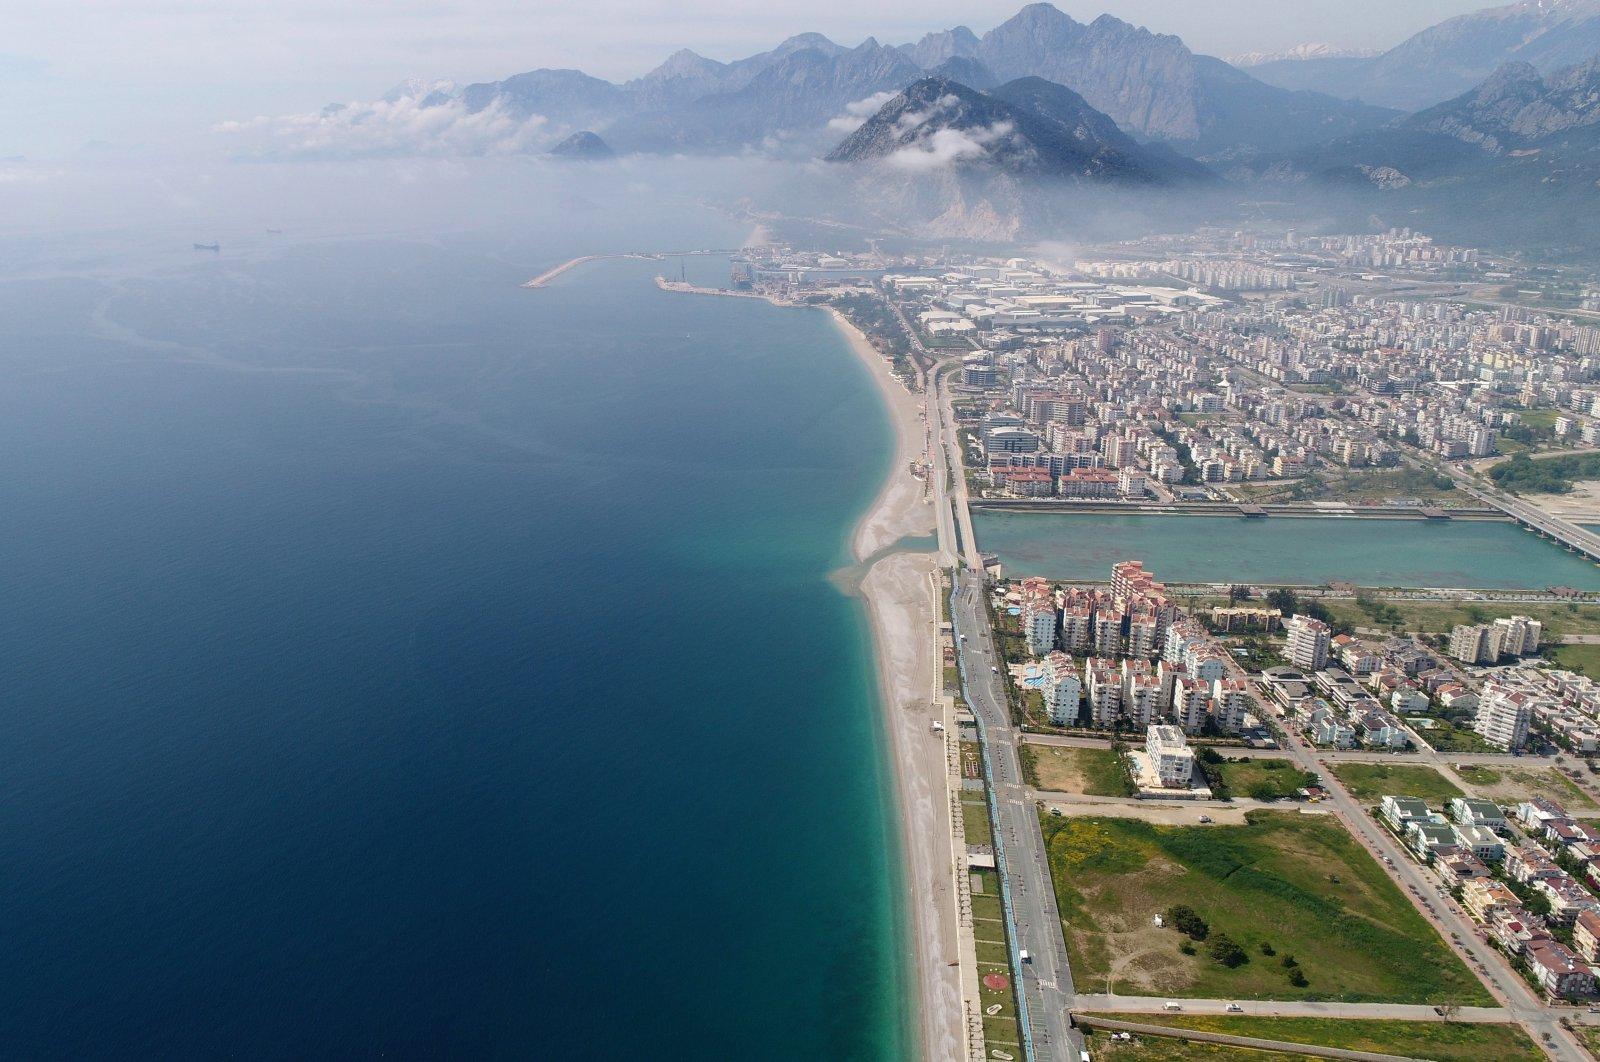 This file photo shows an aerial view of Konyaaltı Beach in Antalya, Turkey, July 20, 2020. (DHA Photo)